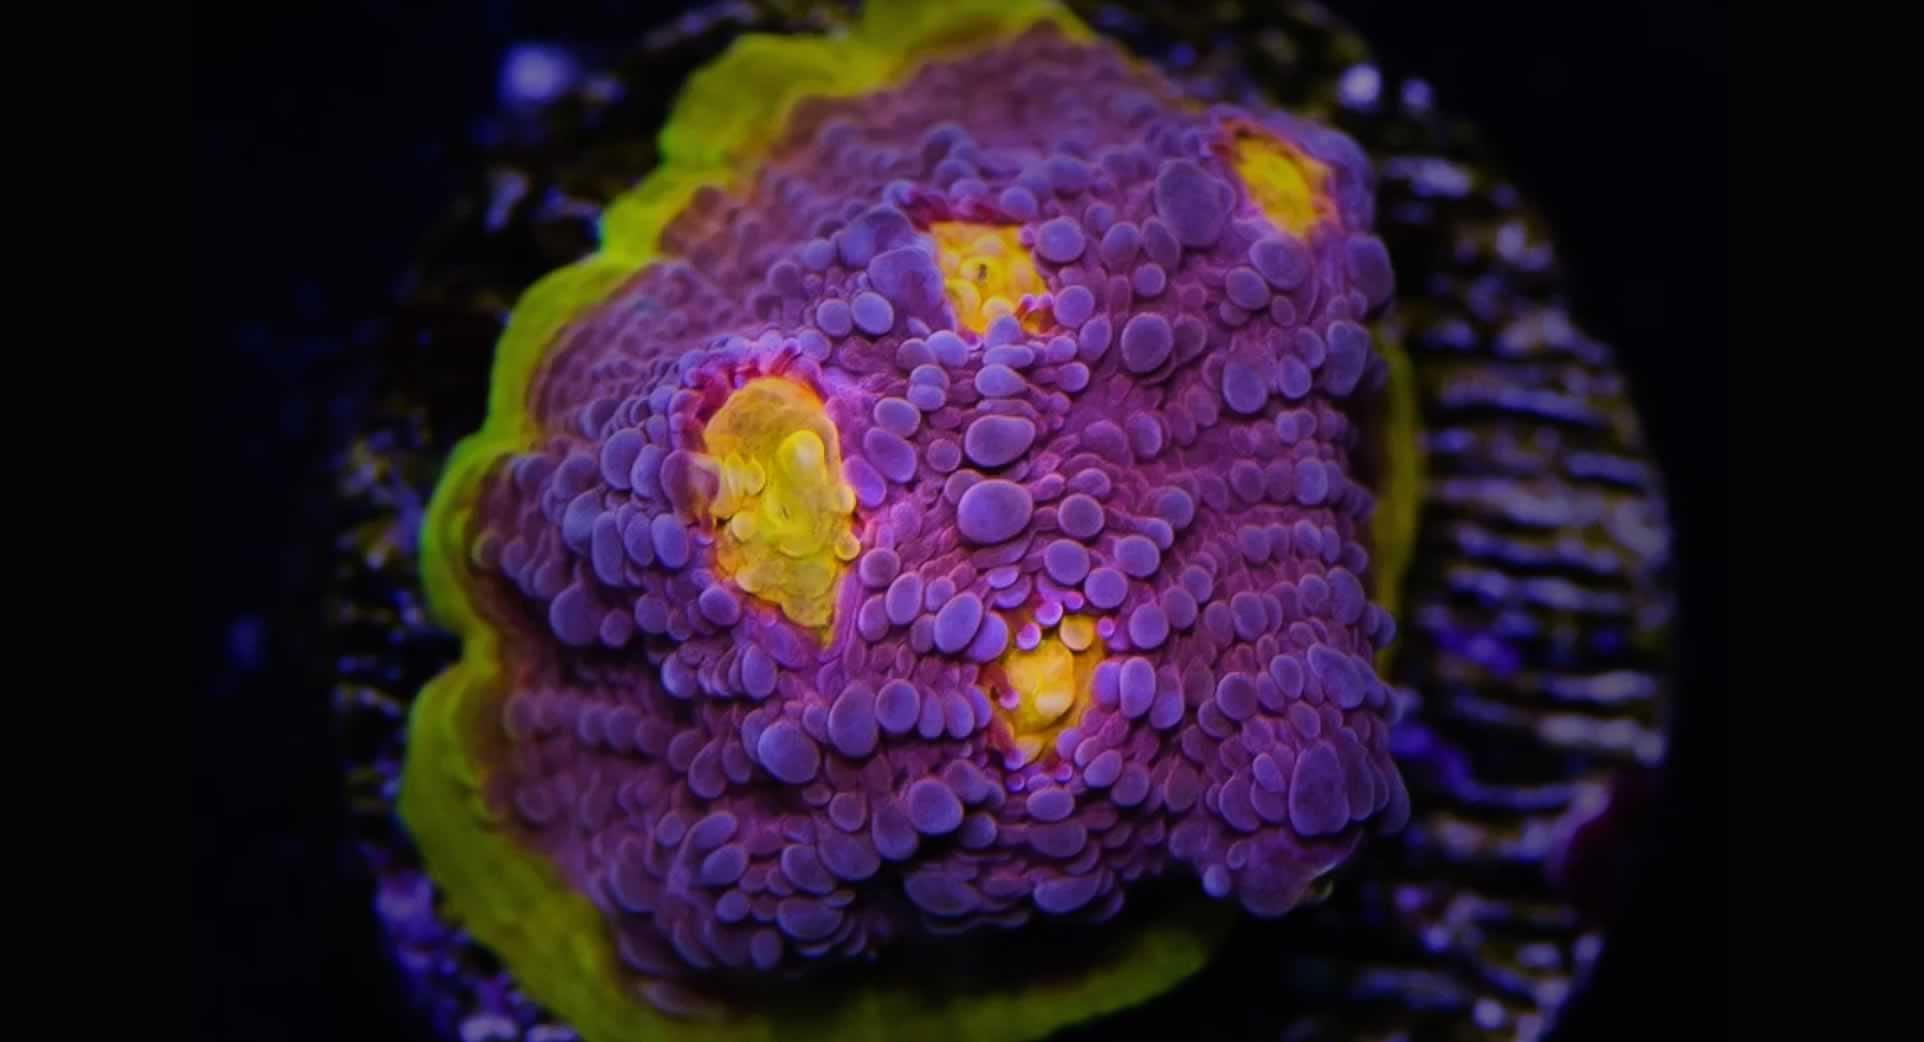 Photoshopped Coral